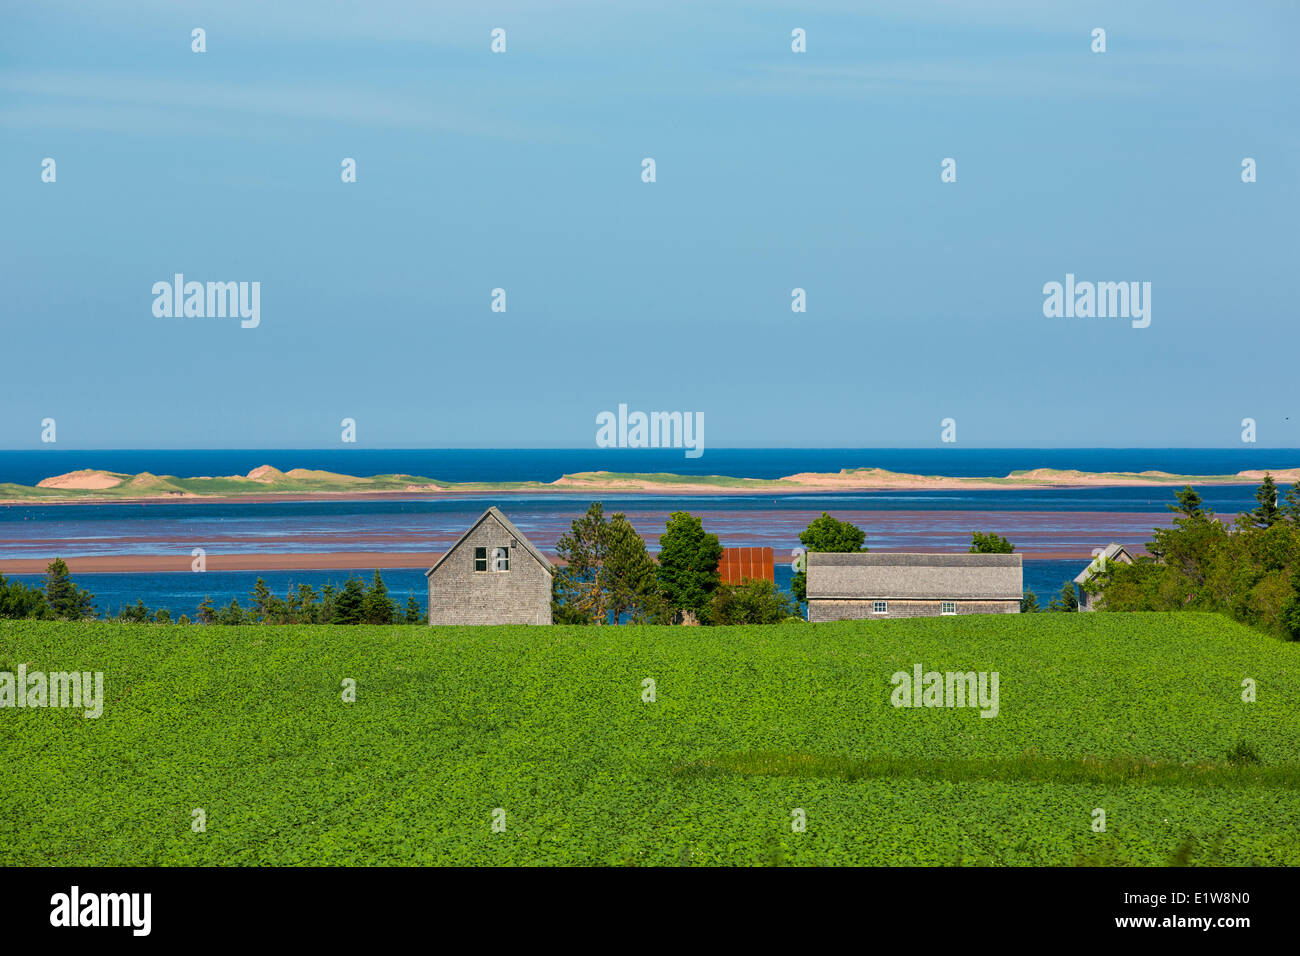 Barns, Springbrook, Prince Edward Island, Canada - Stock Image